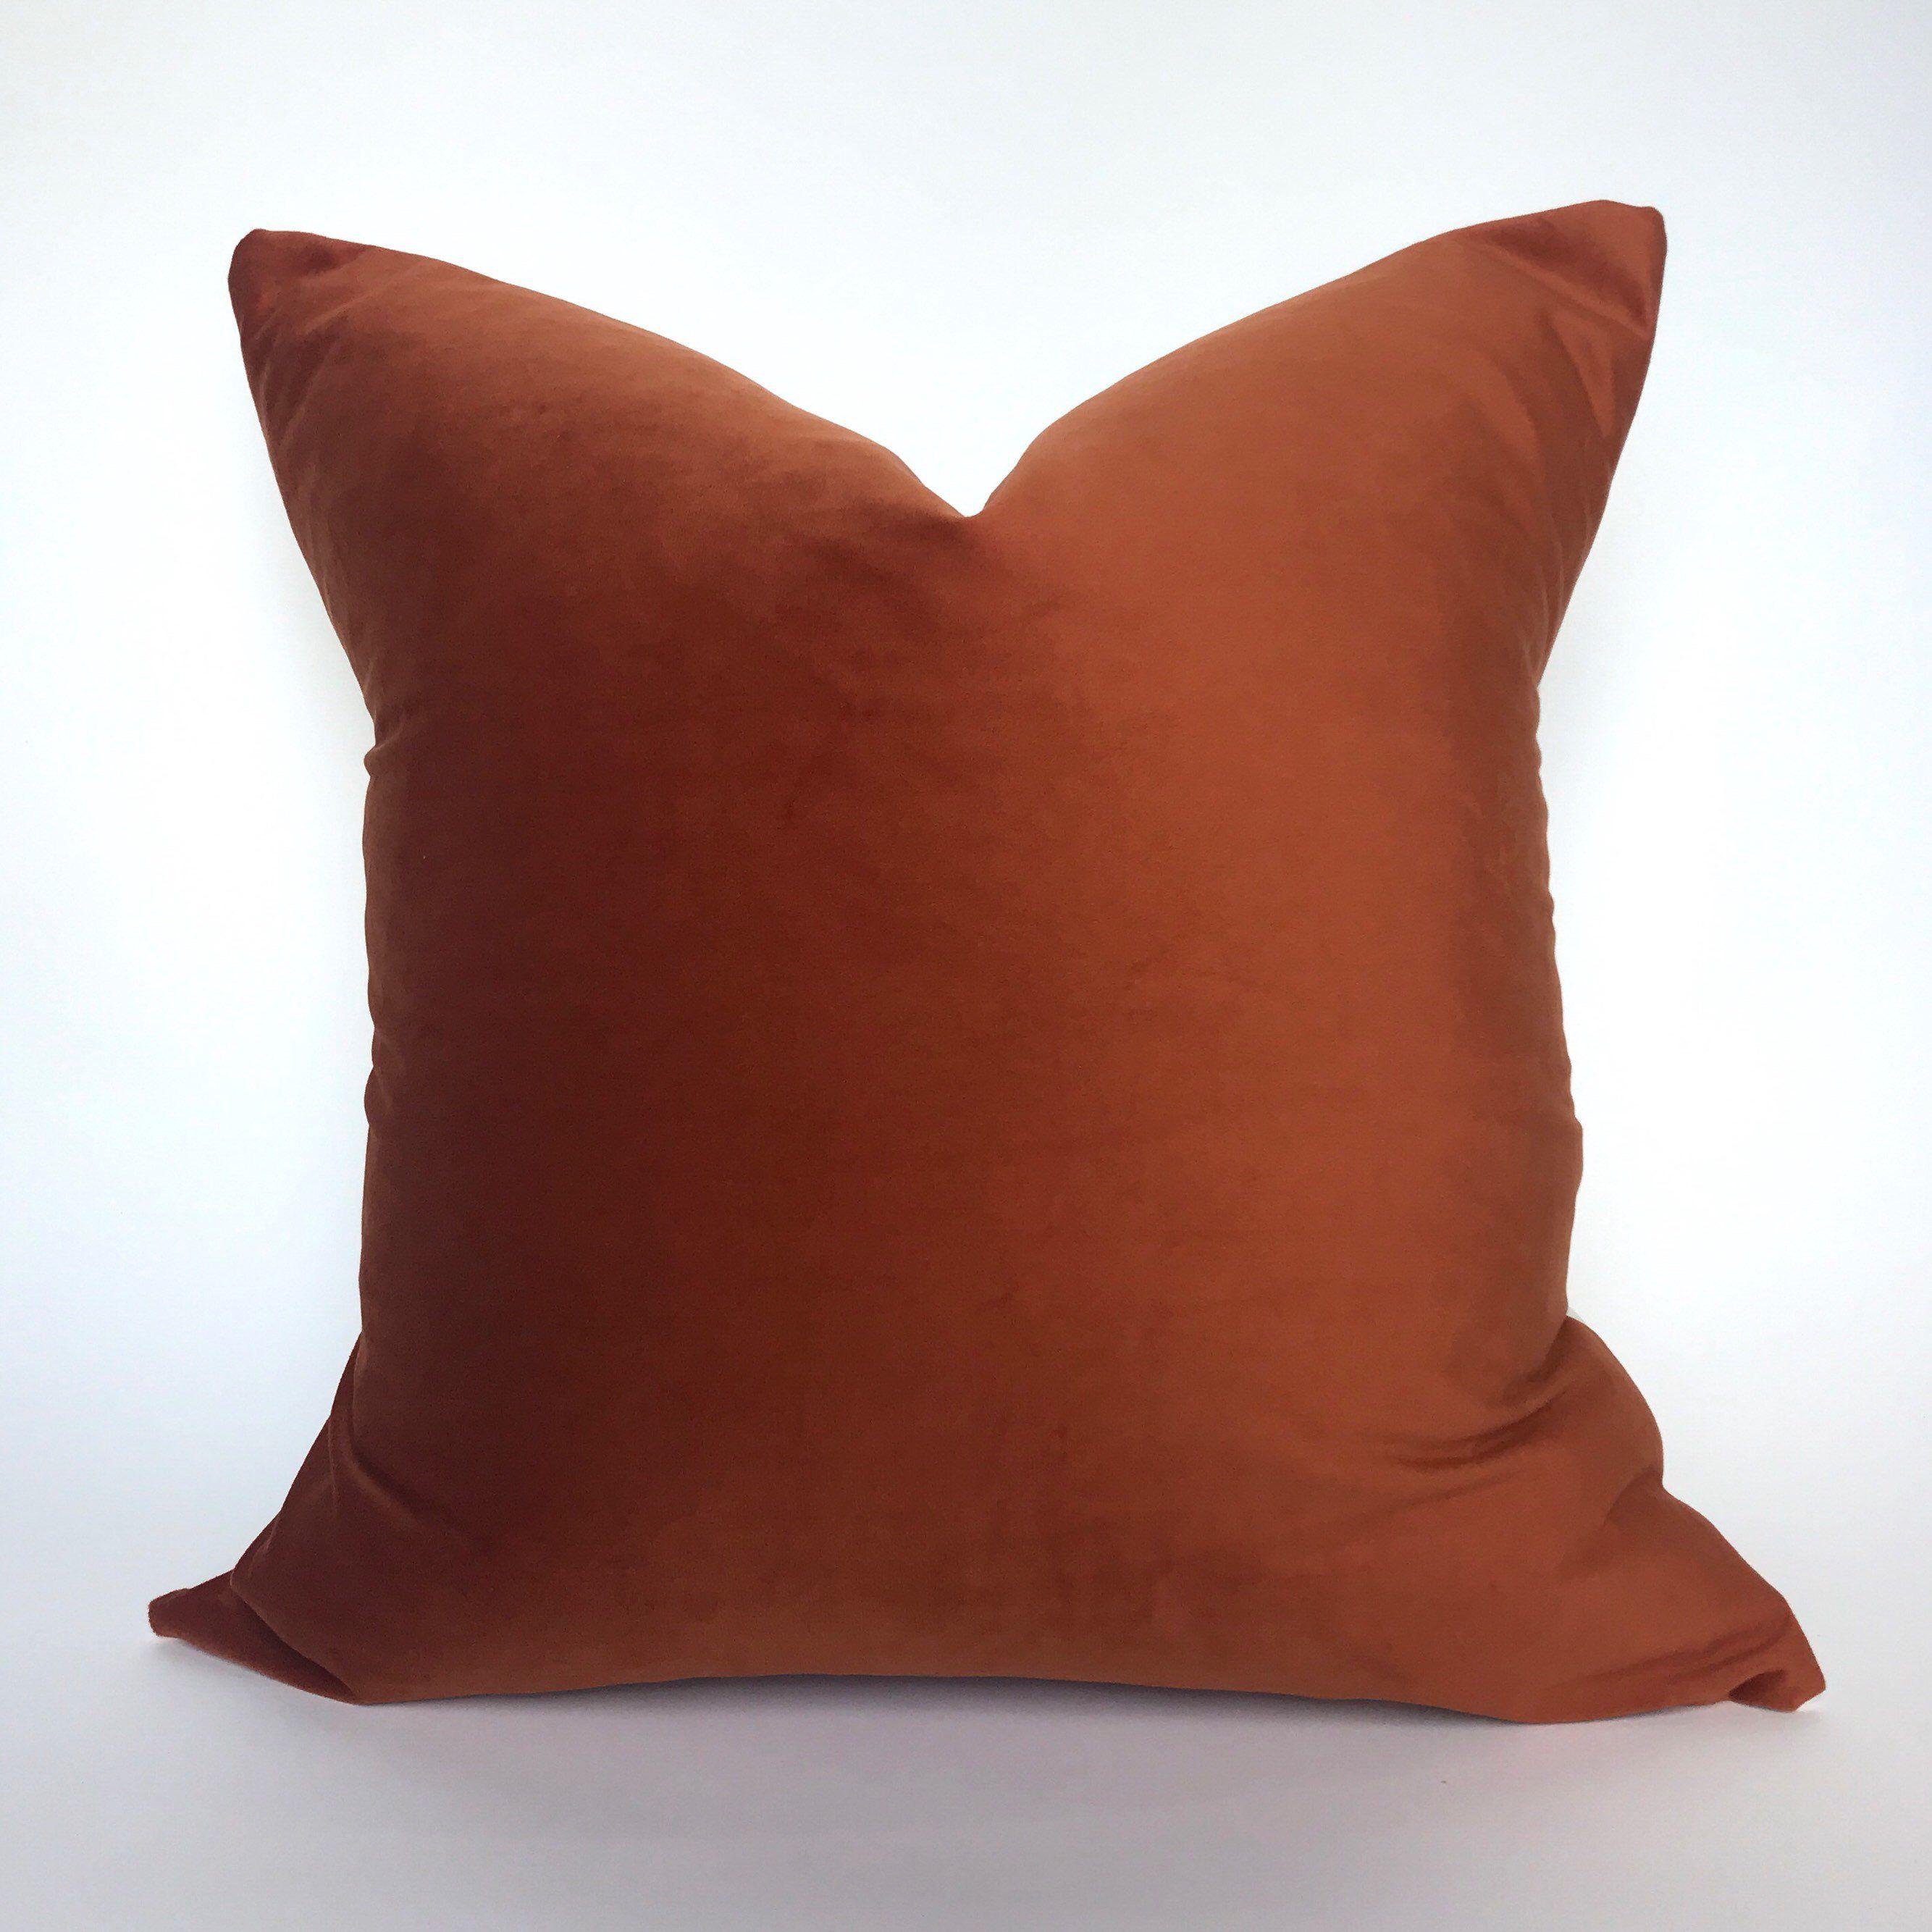 Velvet Pillow Cover Pumpkin Rust Orange With Images Rust